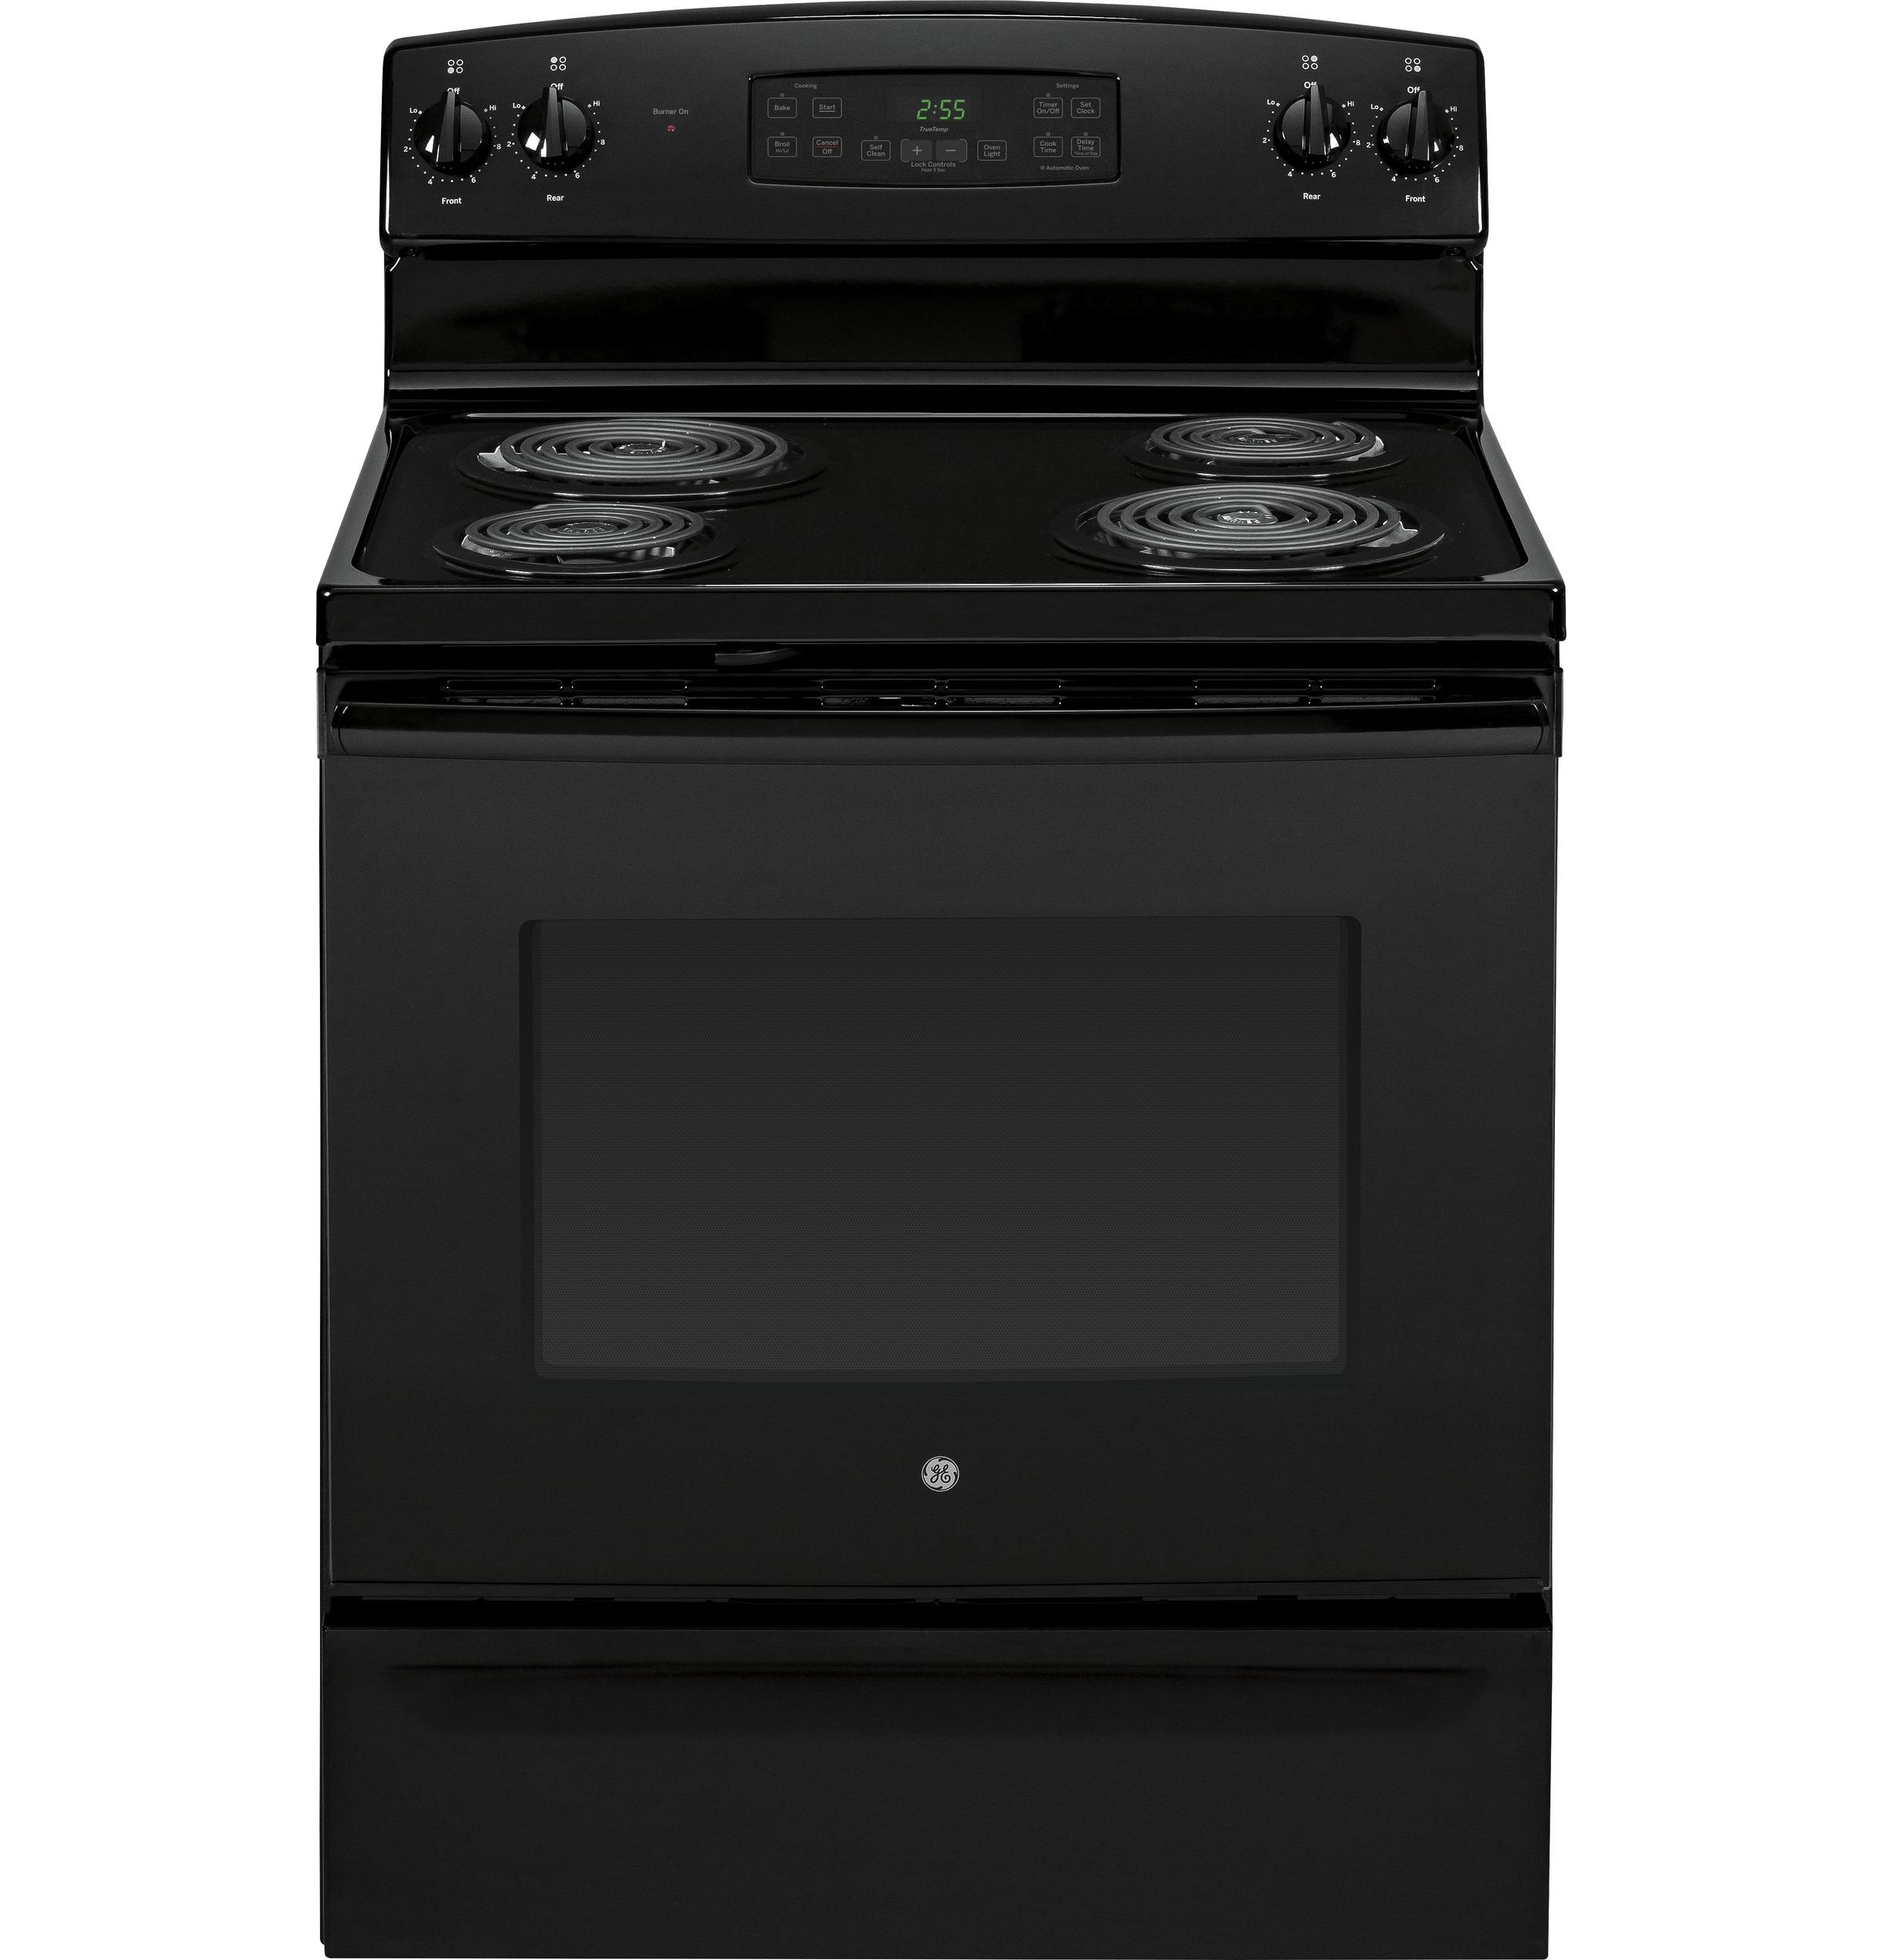 "GE Appliances GE Electric Ranges 30"" Free-Standing Electric Range - Item Number: JB255DJBB"